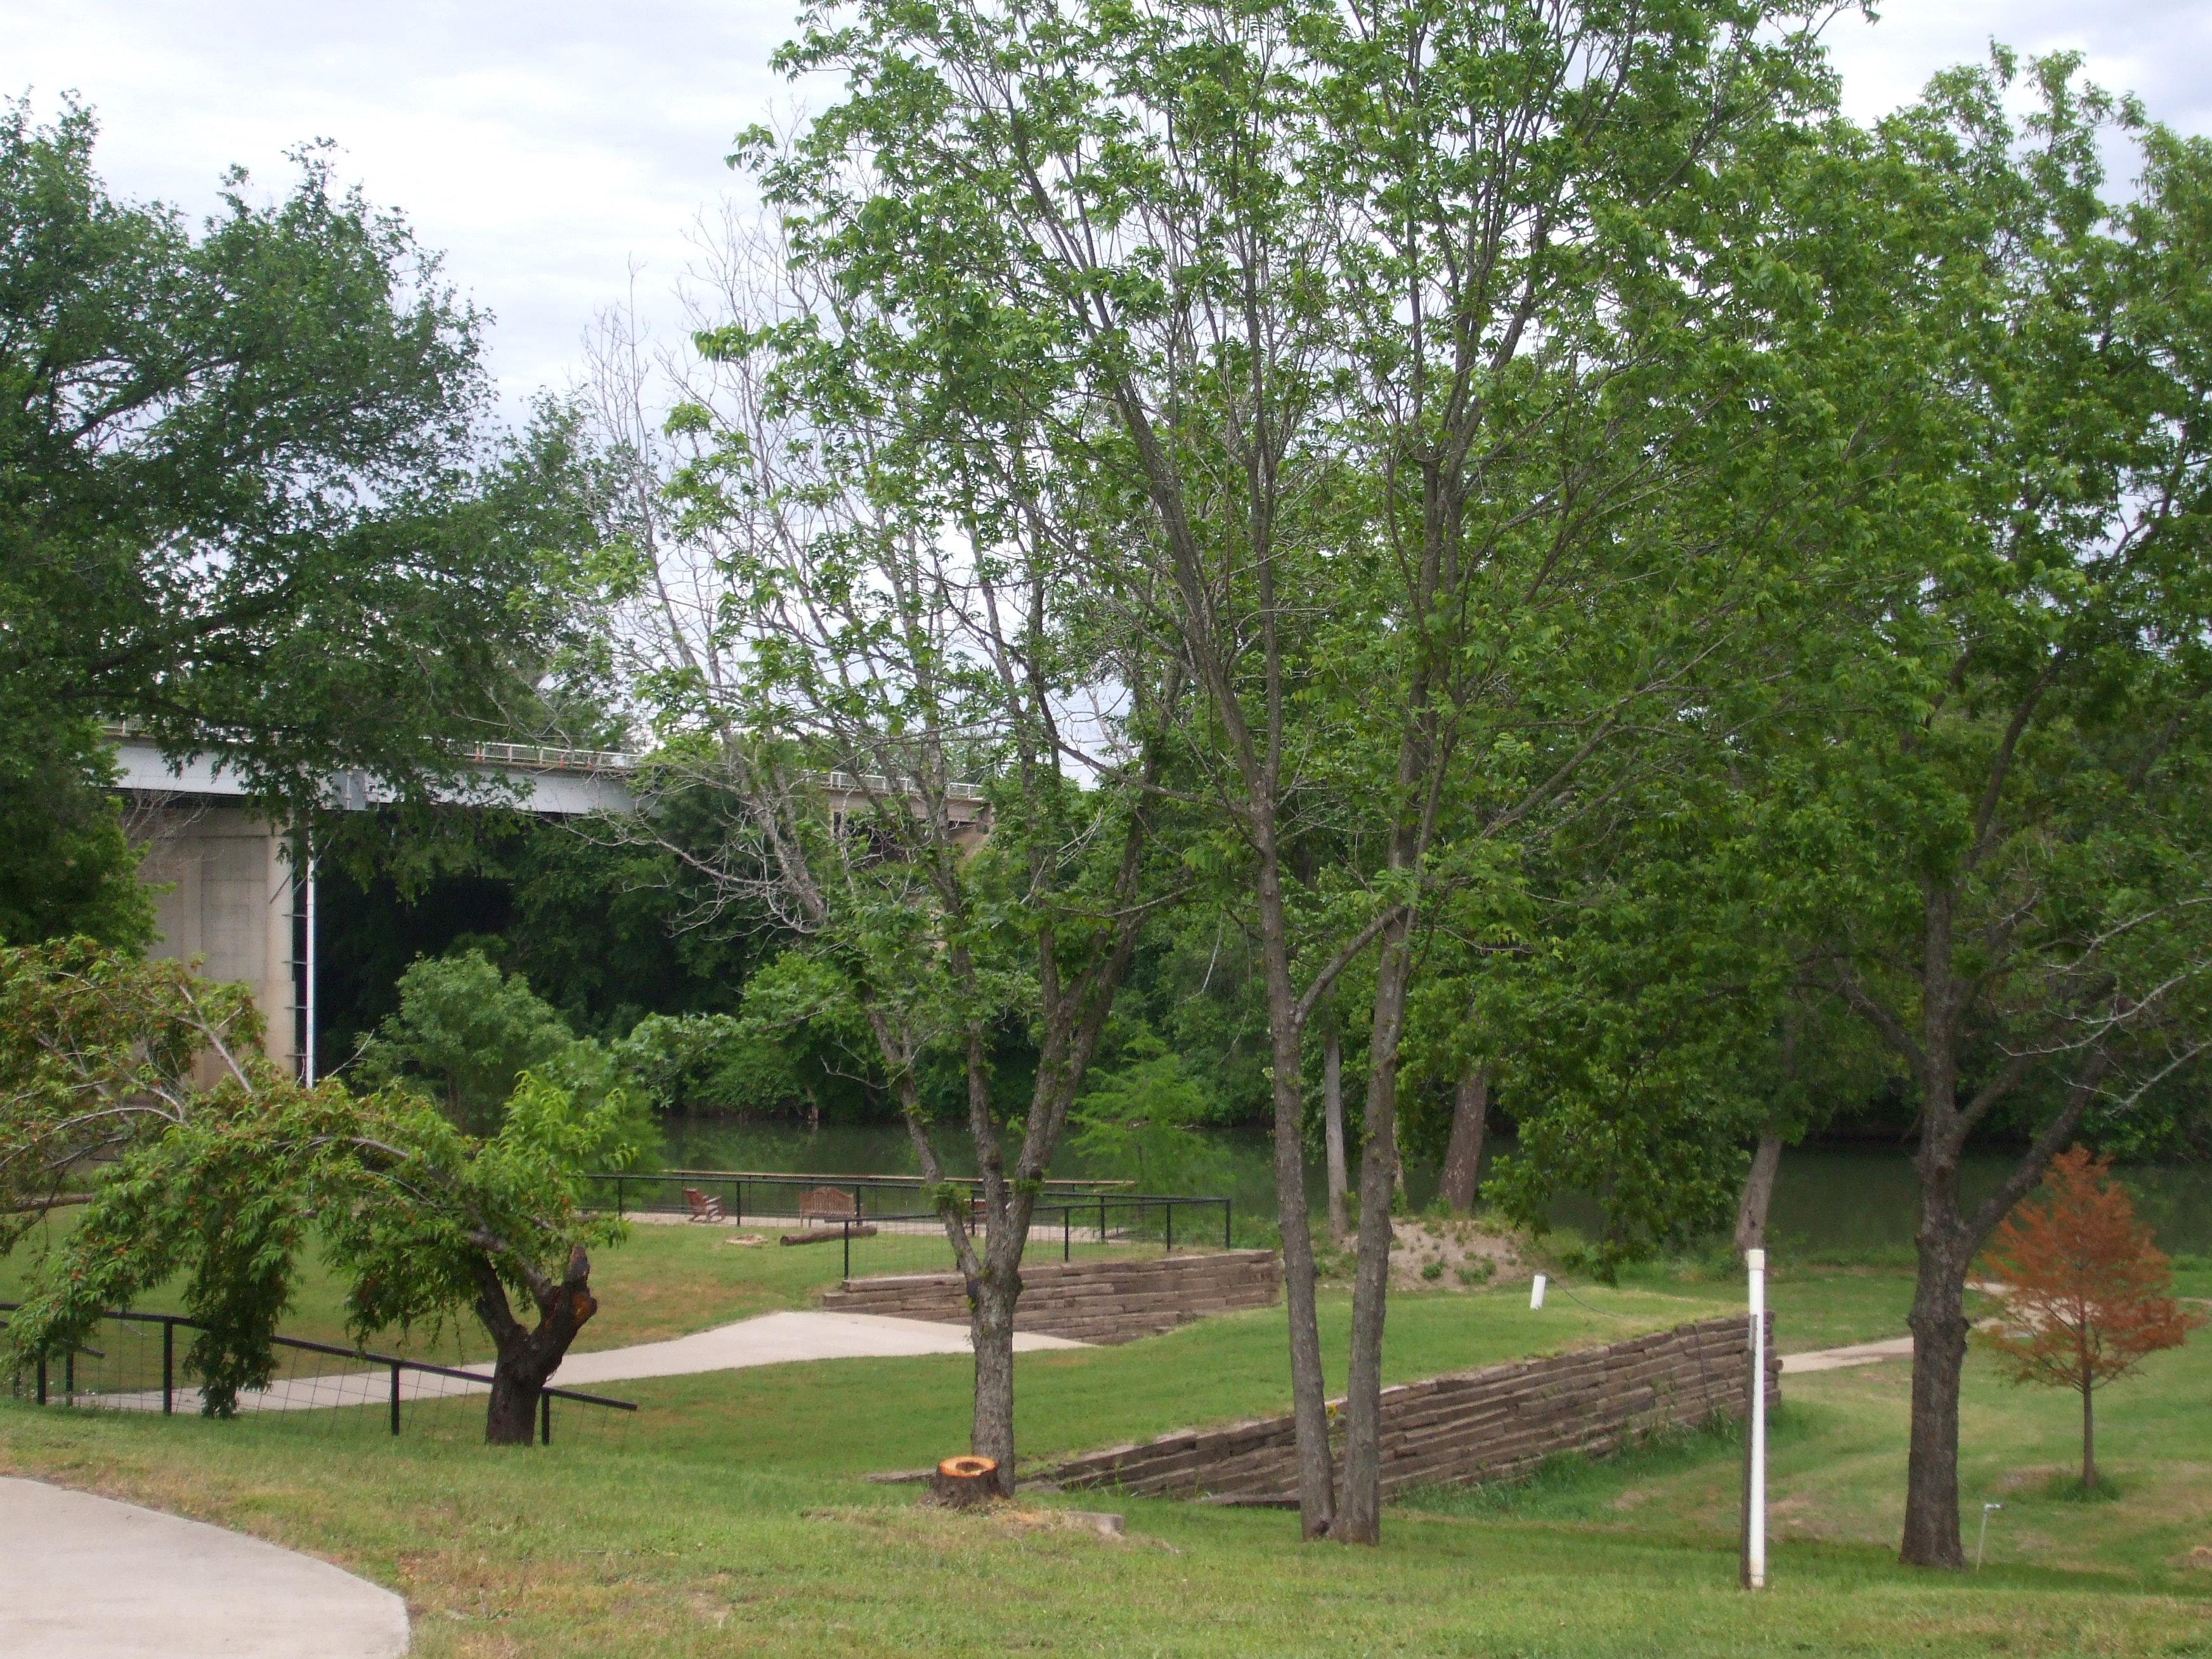 Bastrop / SE Austin / Colorado River KOA Holiday image 1